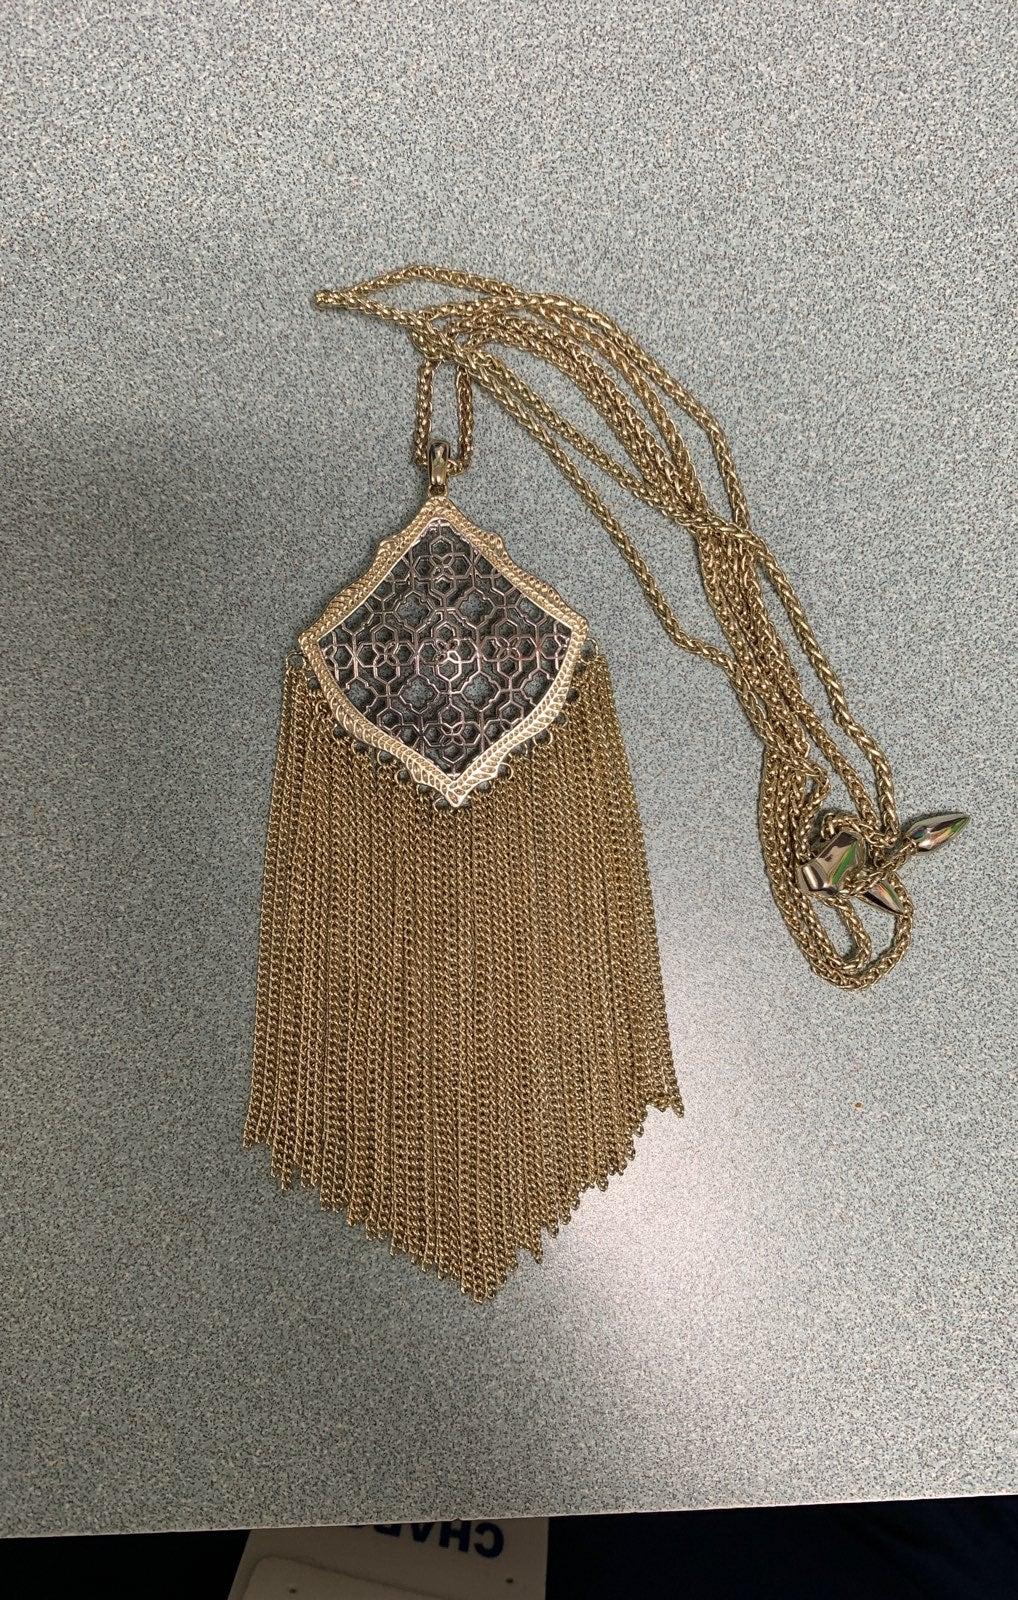 kendea scott necklace